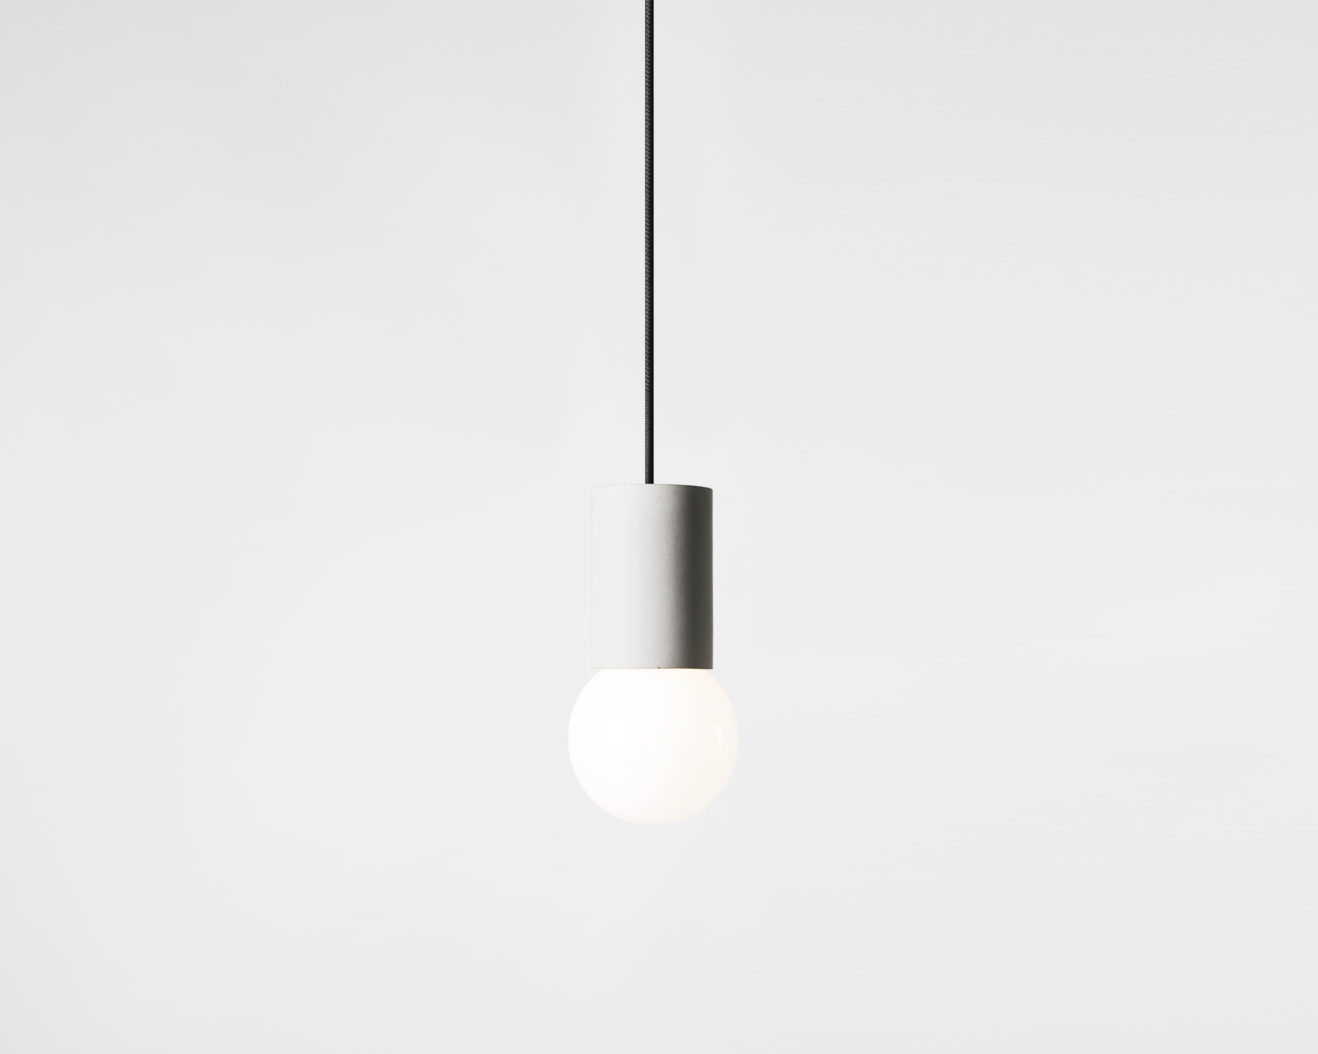 Ball_Bentu_Design_Lamp_2-1318x1054